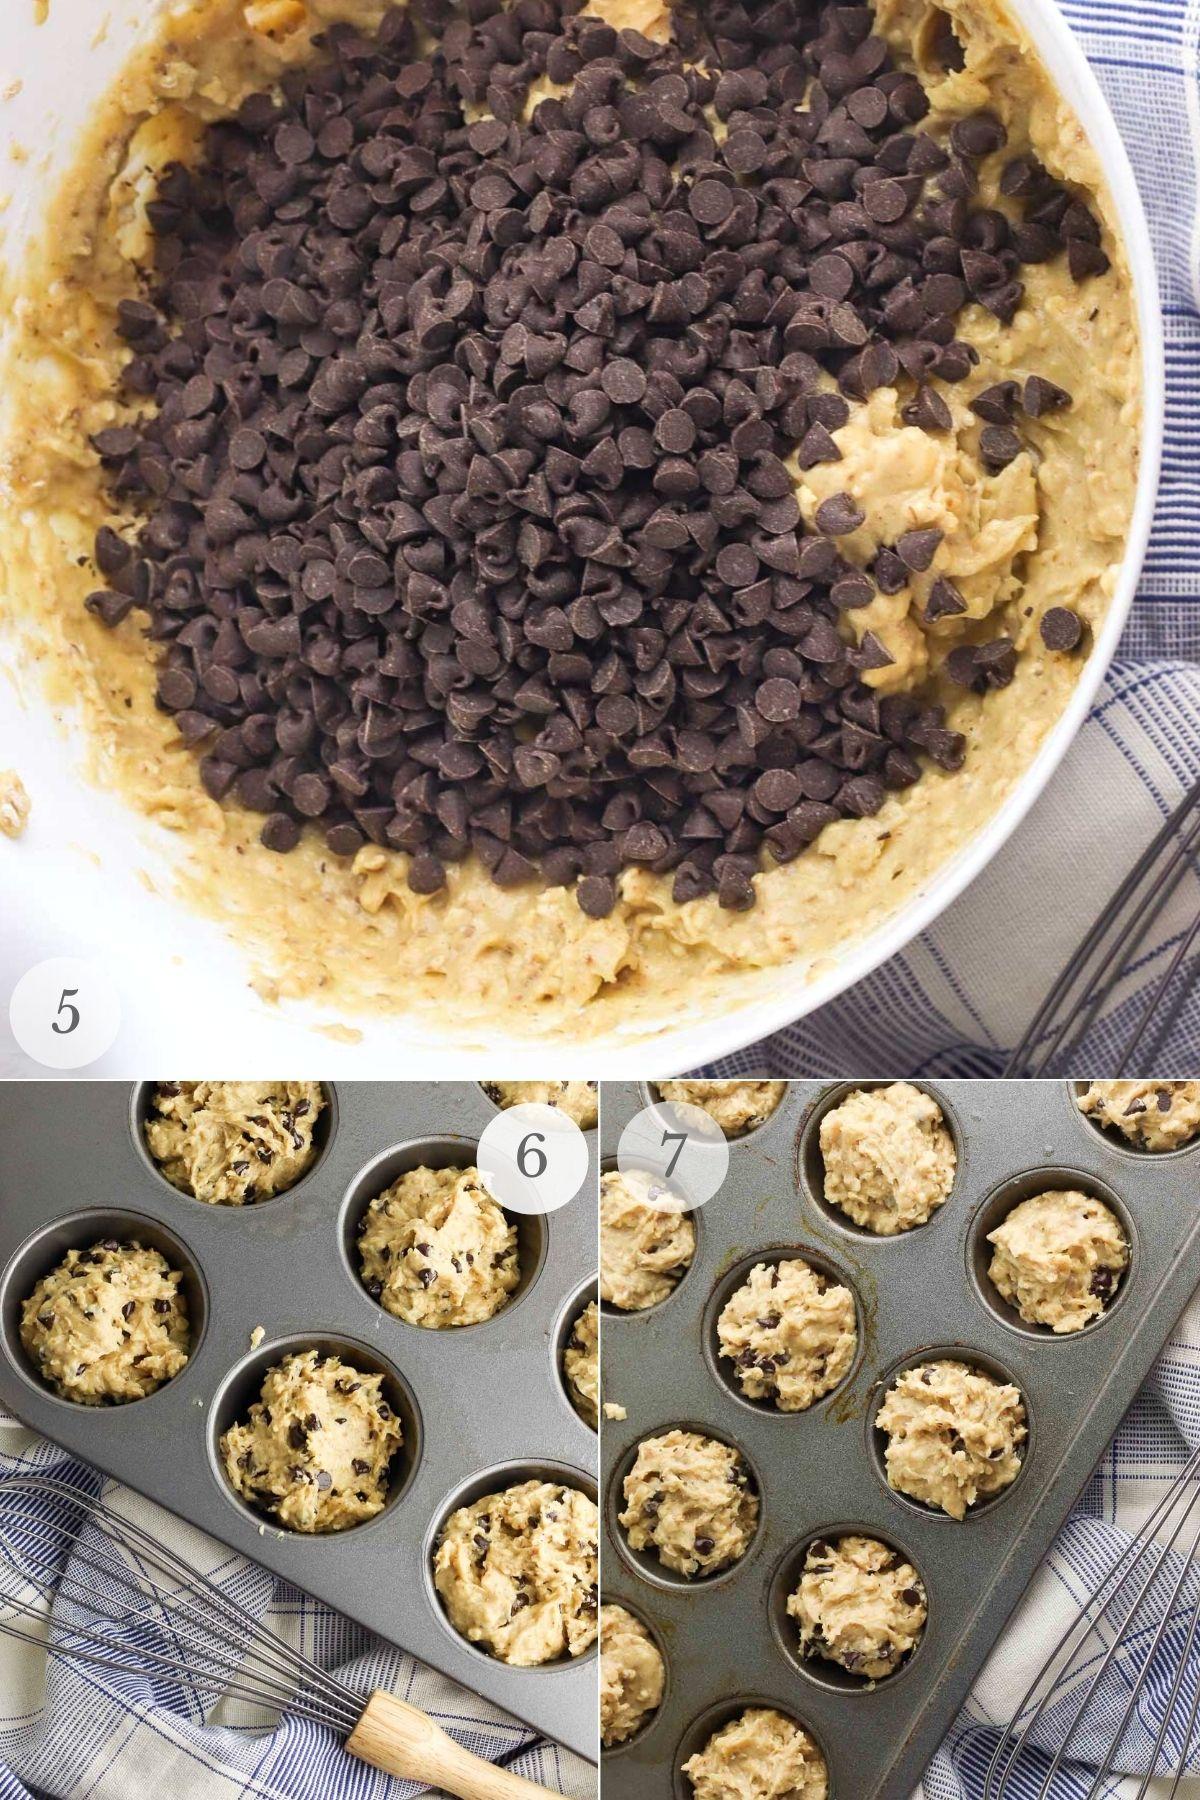 peanut butter banana muffins recipe steps 5-7